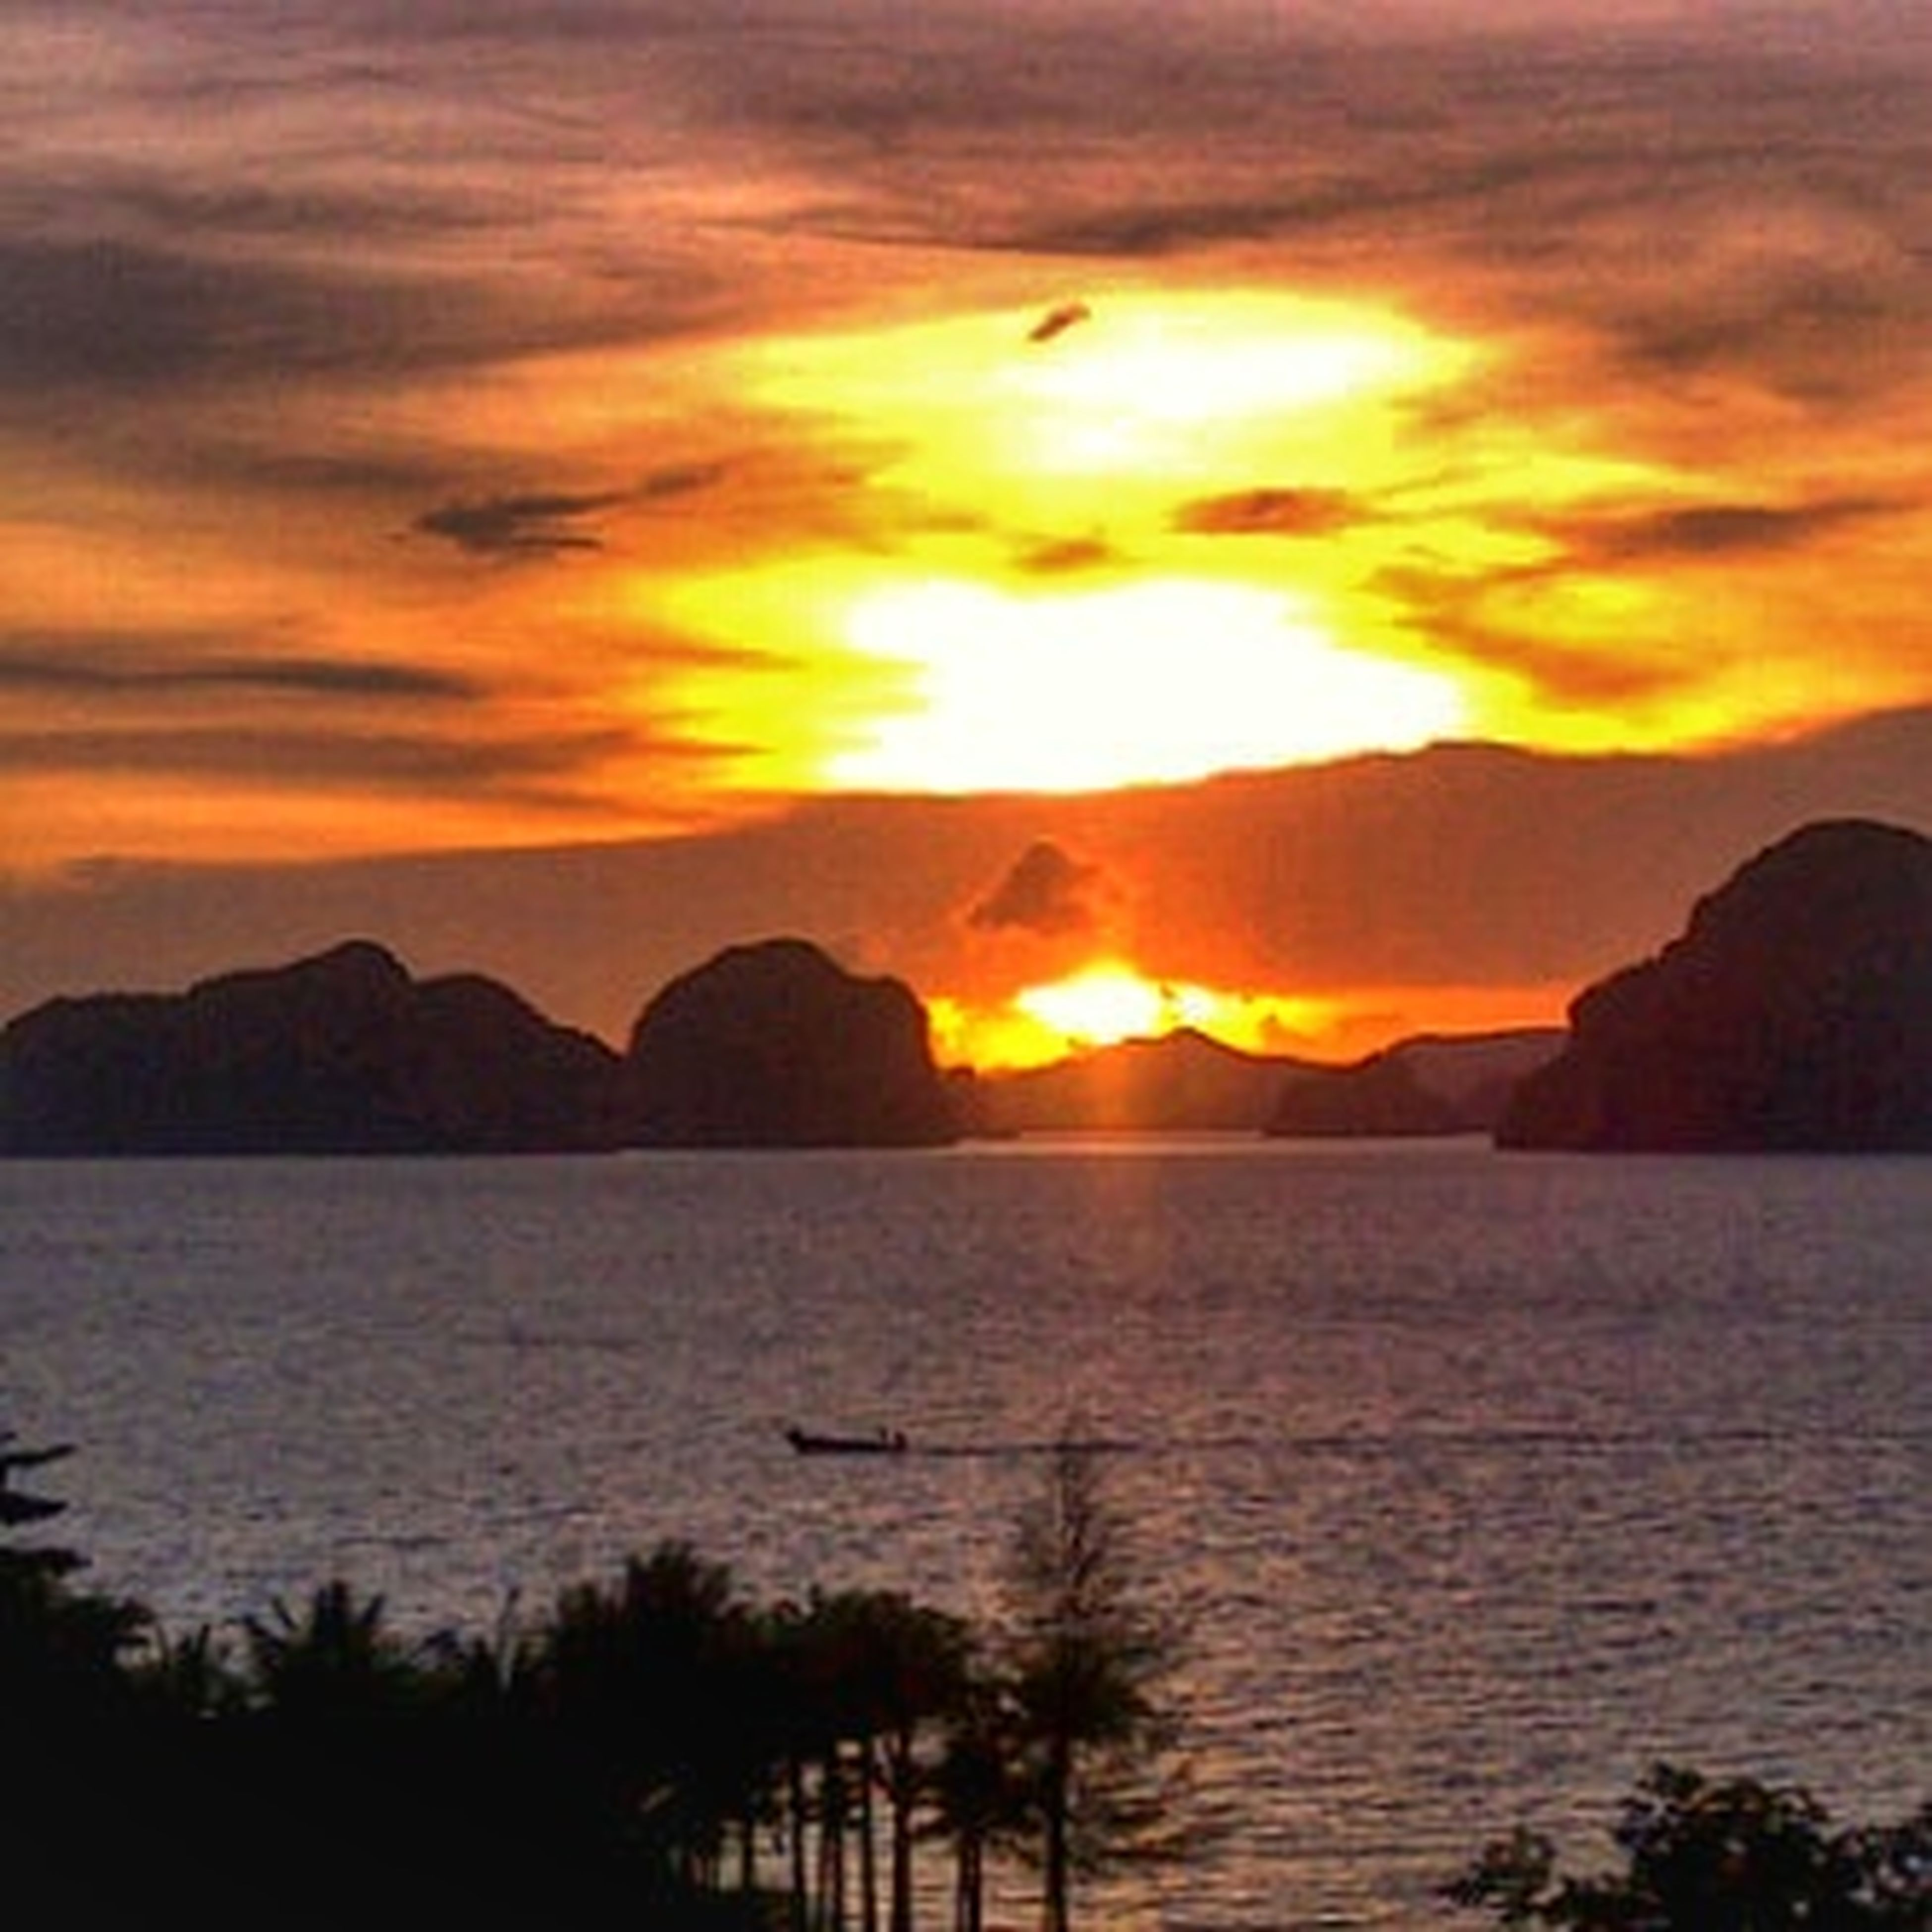 sunset, scenics, sun, tranquil scene, water, silhouette, orange color, beauty in nature, sky, tranquility, mountain, idyllic, nature, sea, cloud - sky, reflection, dramatic sky, lake, mountain range, cloud